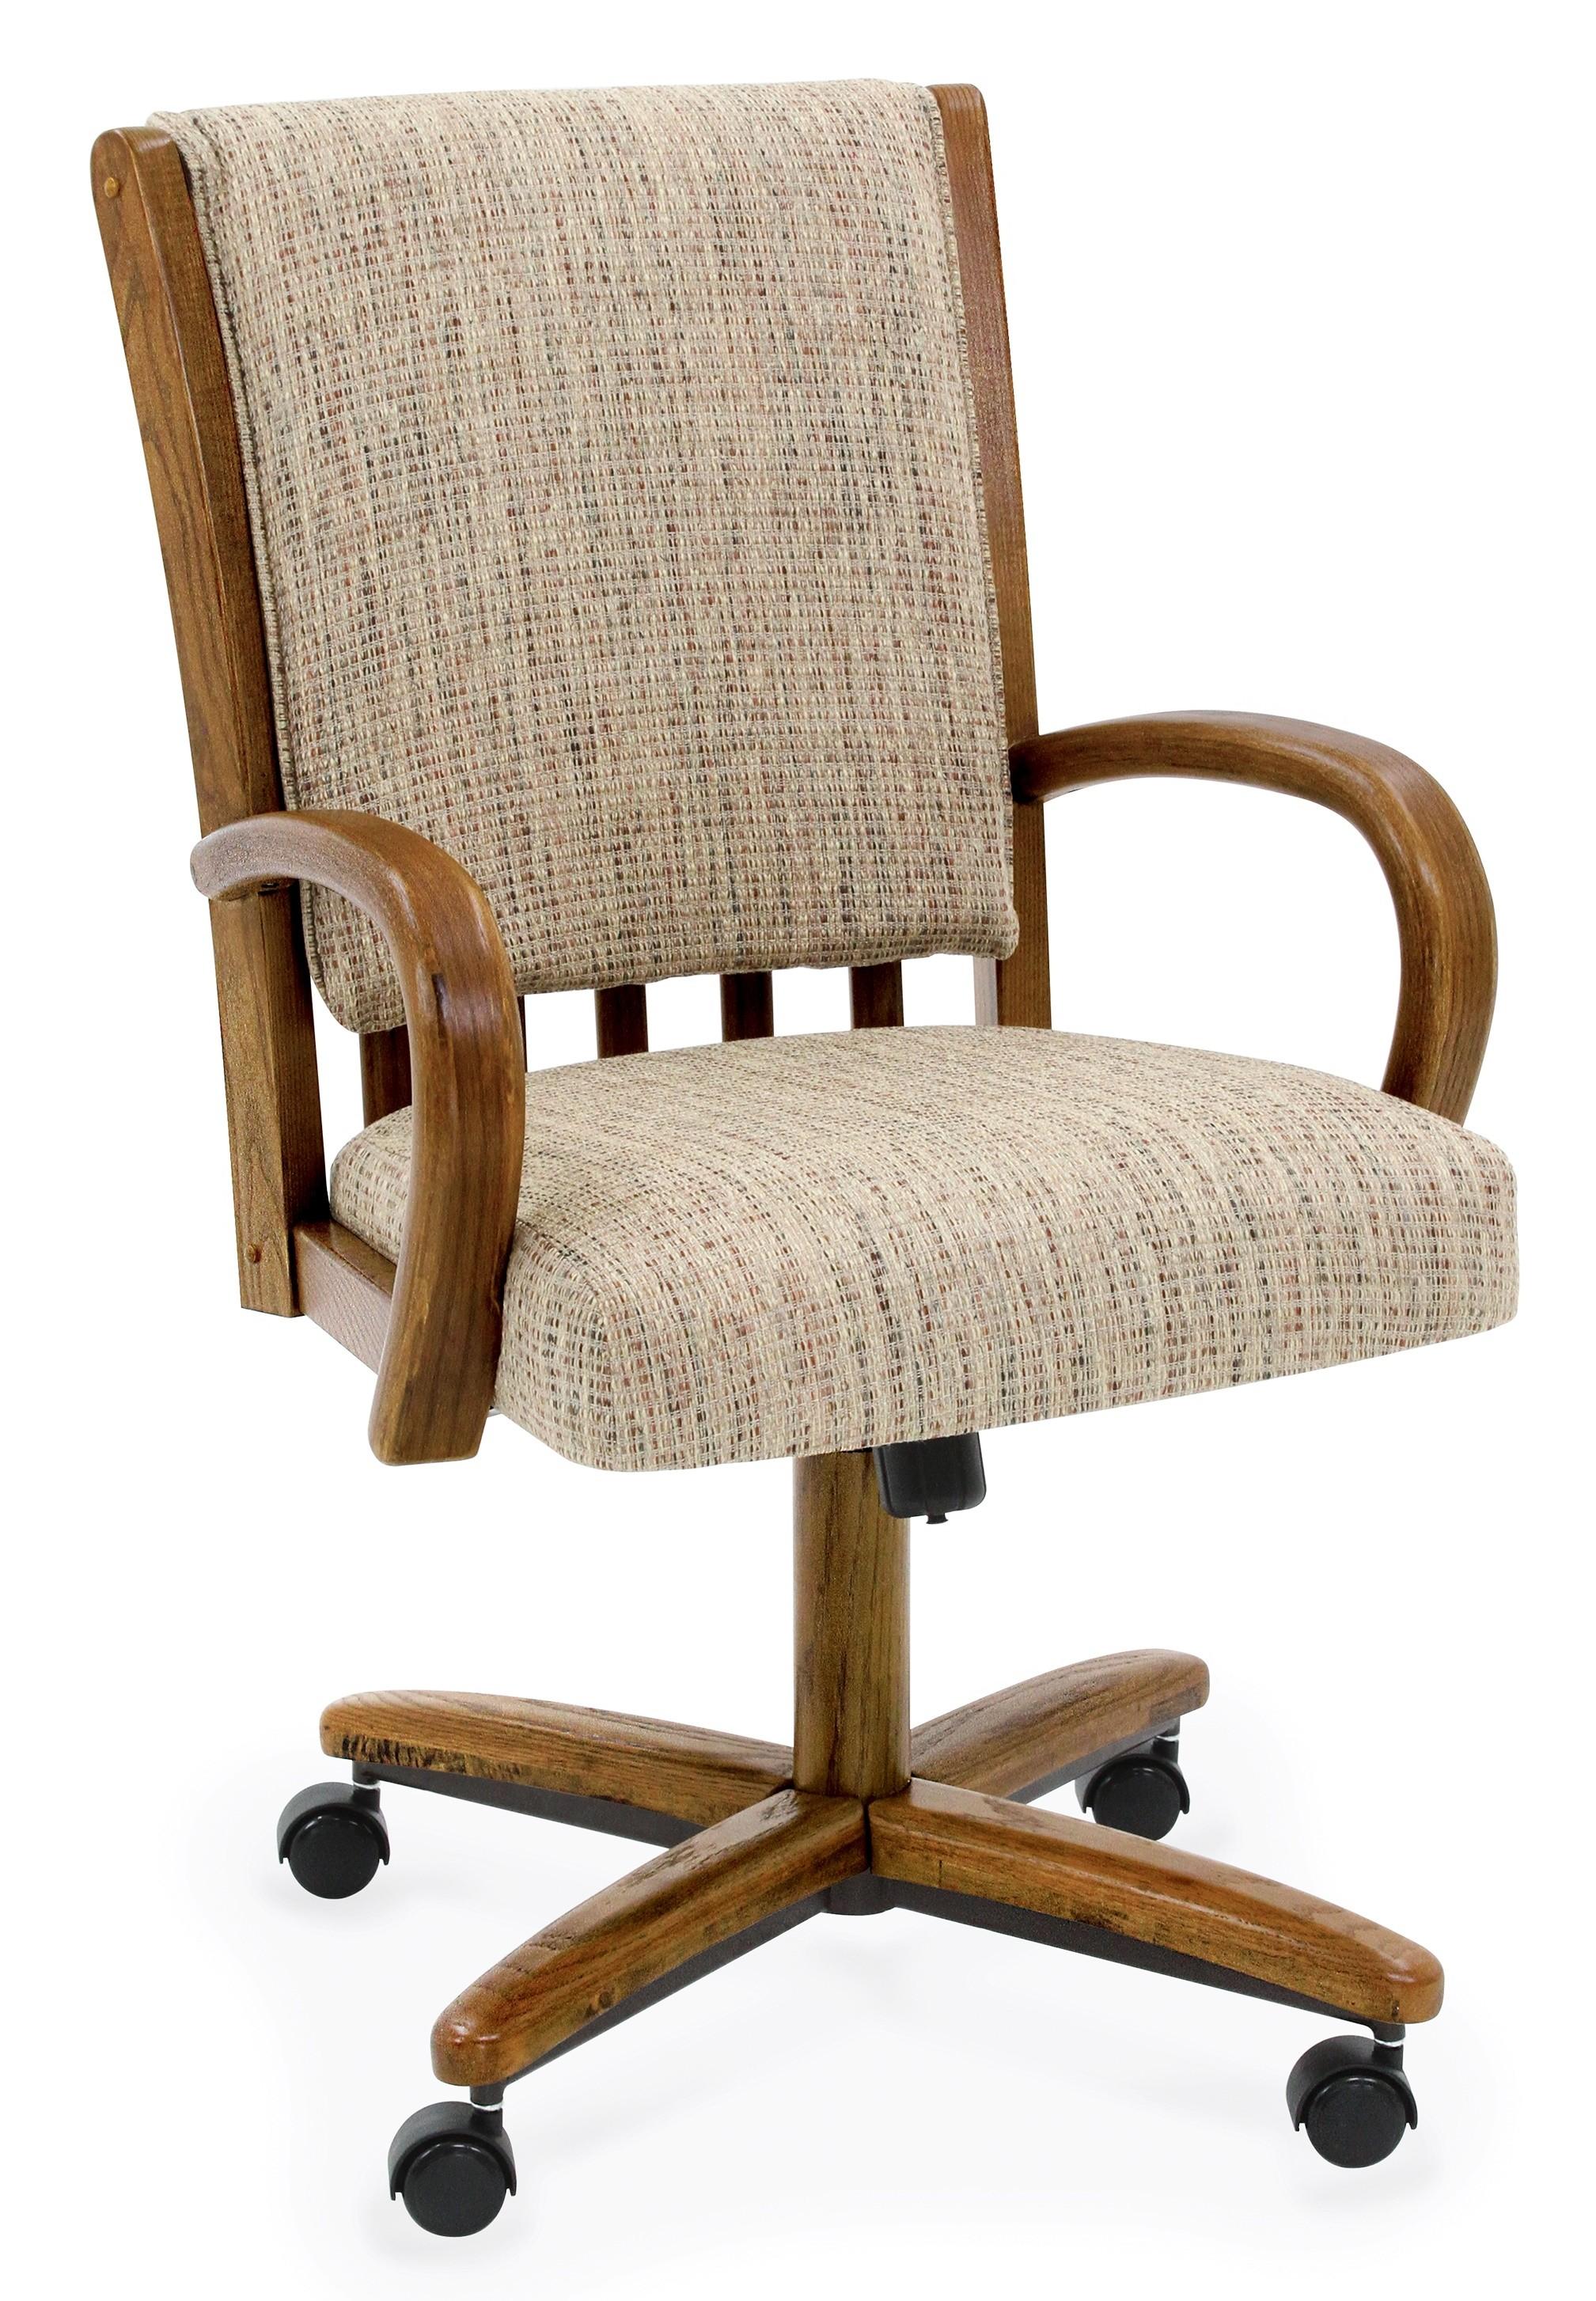 Pleasing Chromcraft Zip Ship C177 946 Swivel Roller Rocker Chairs Cjindustries Chair Design For Home Cjindustriesco